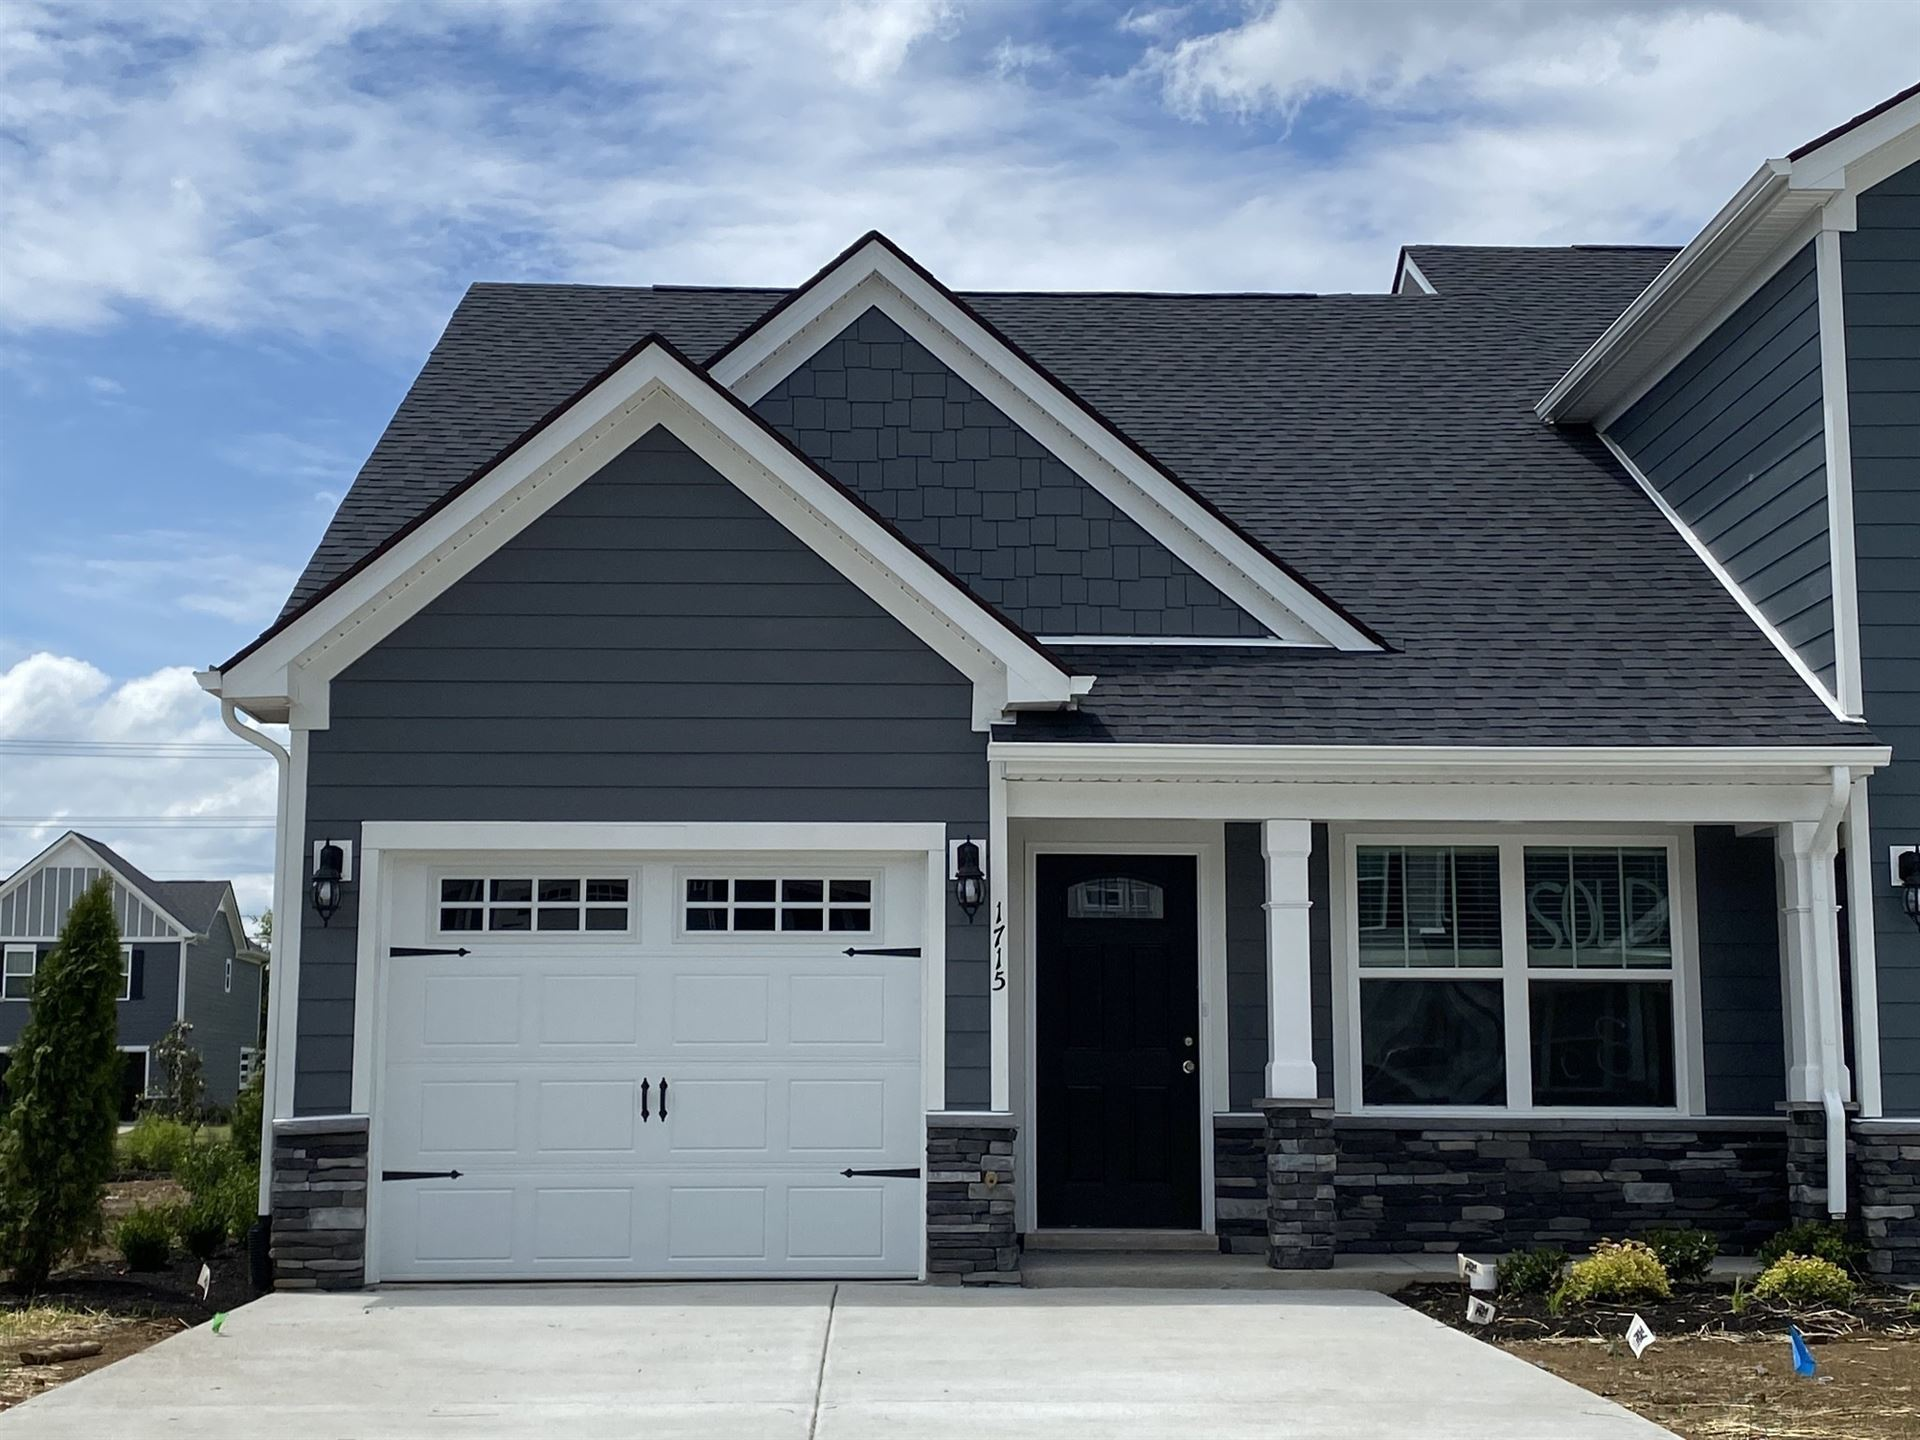 1639 Calypso Drive Lot 58 #58, Murfreesboro, TN 37128 - MLS#: 2206789